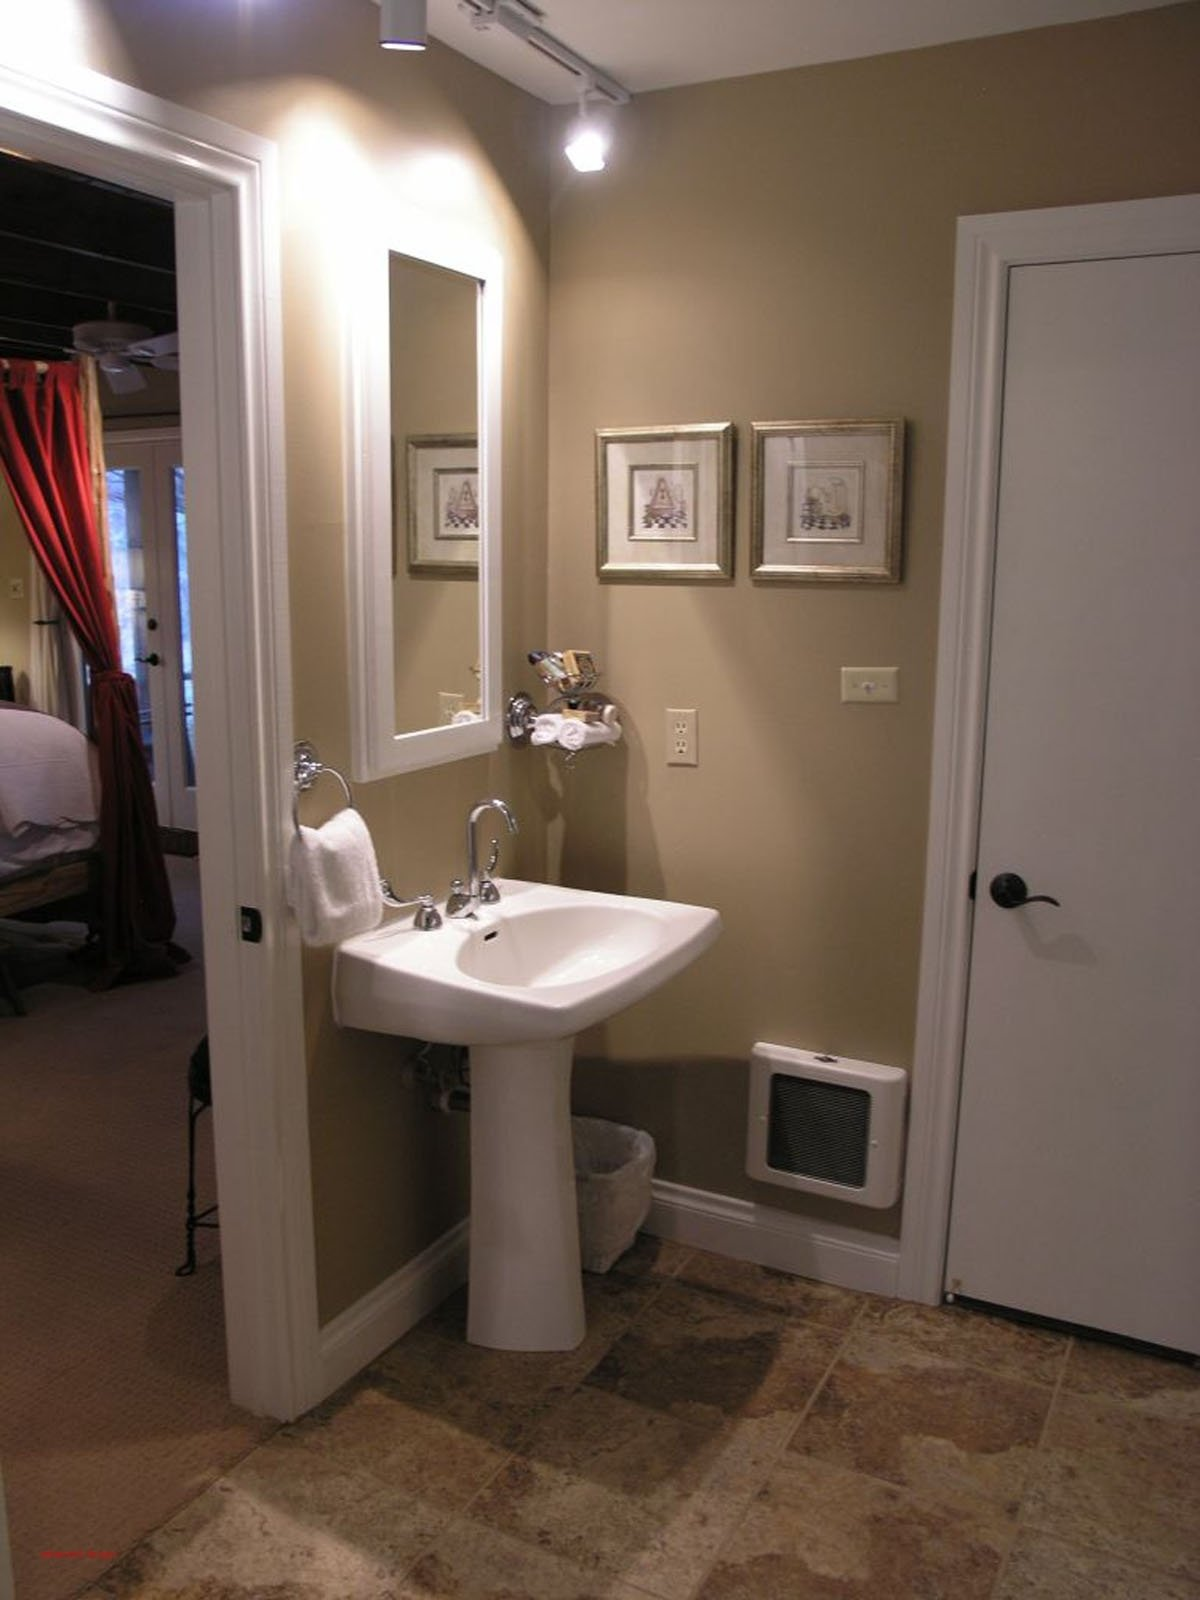 10 Unique Color Ideas For Small Bathrooms small bathroom paint color ideas new bathroom floor ideas for small